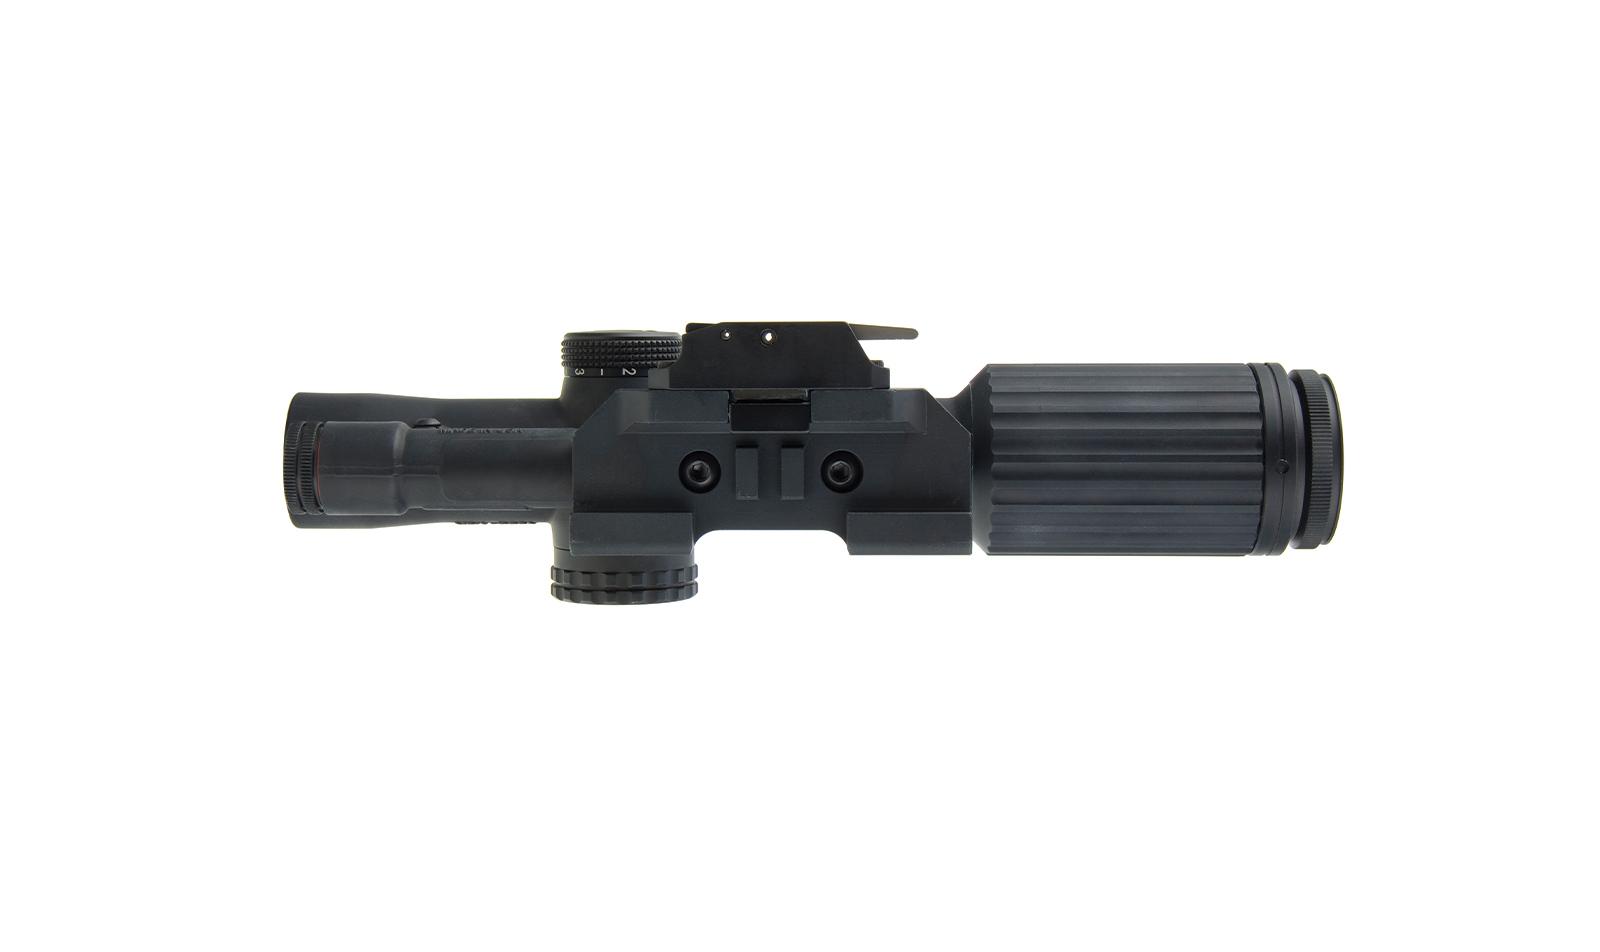 VC16-C-1600007 angle 10